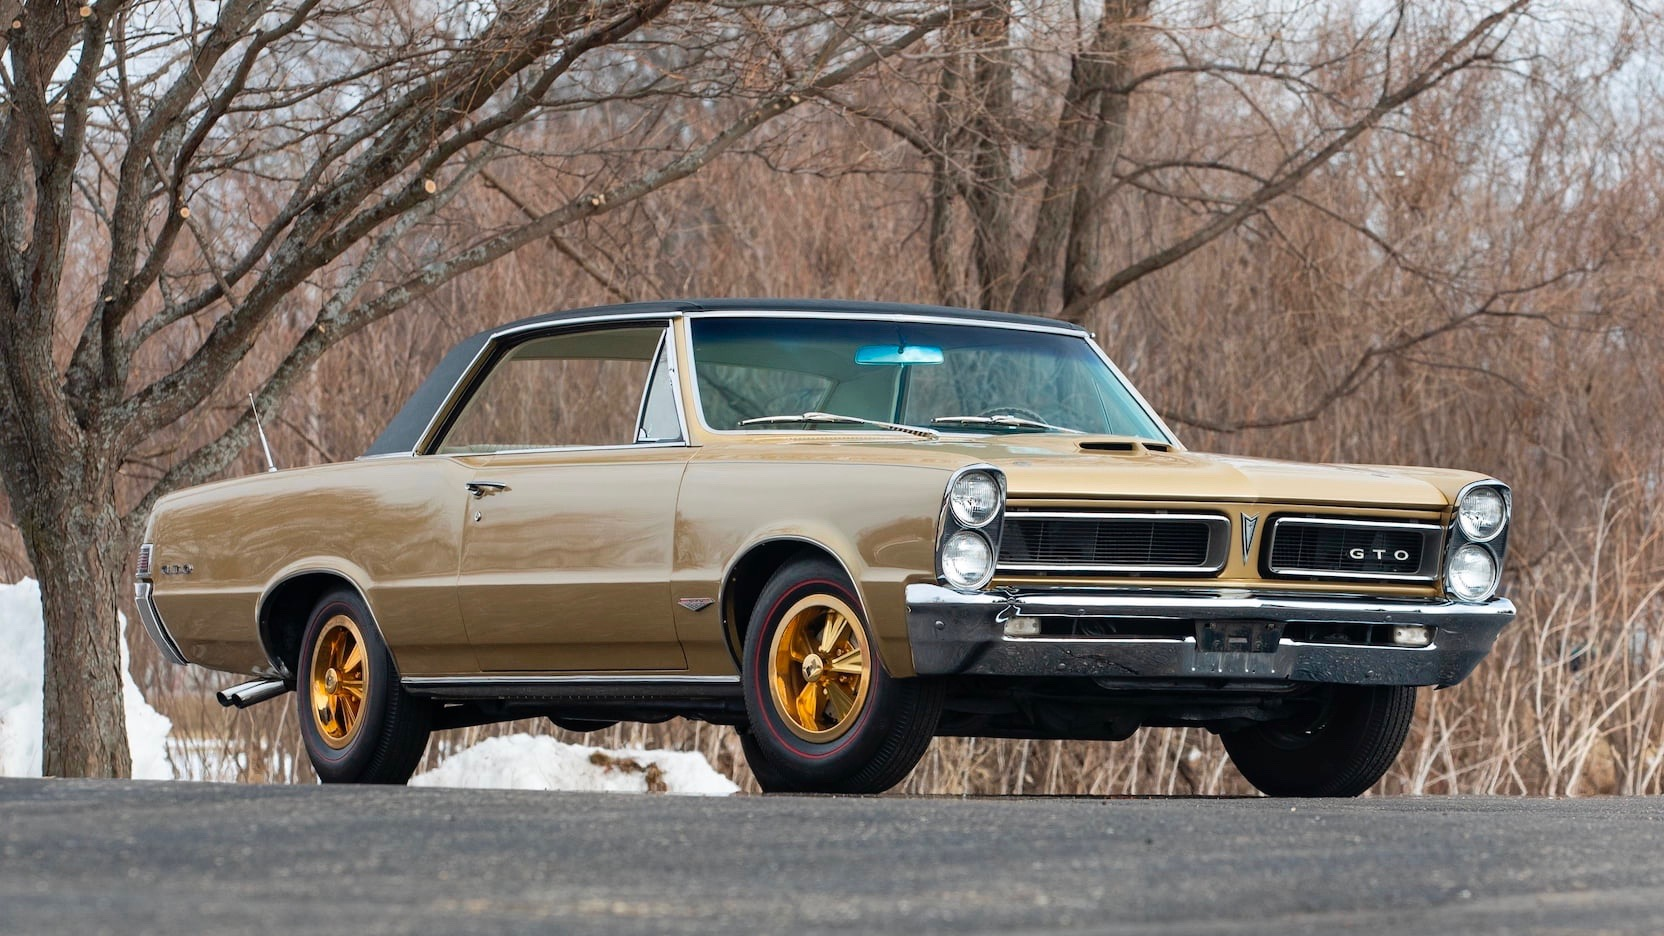 1965 Pontiac Hurst GeeTO Tiger special edition up for auction